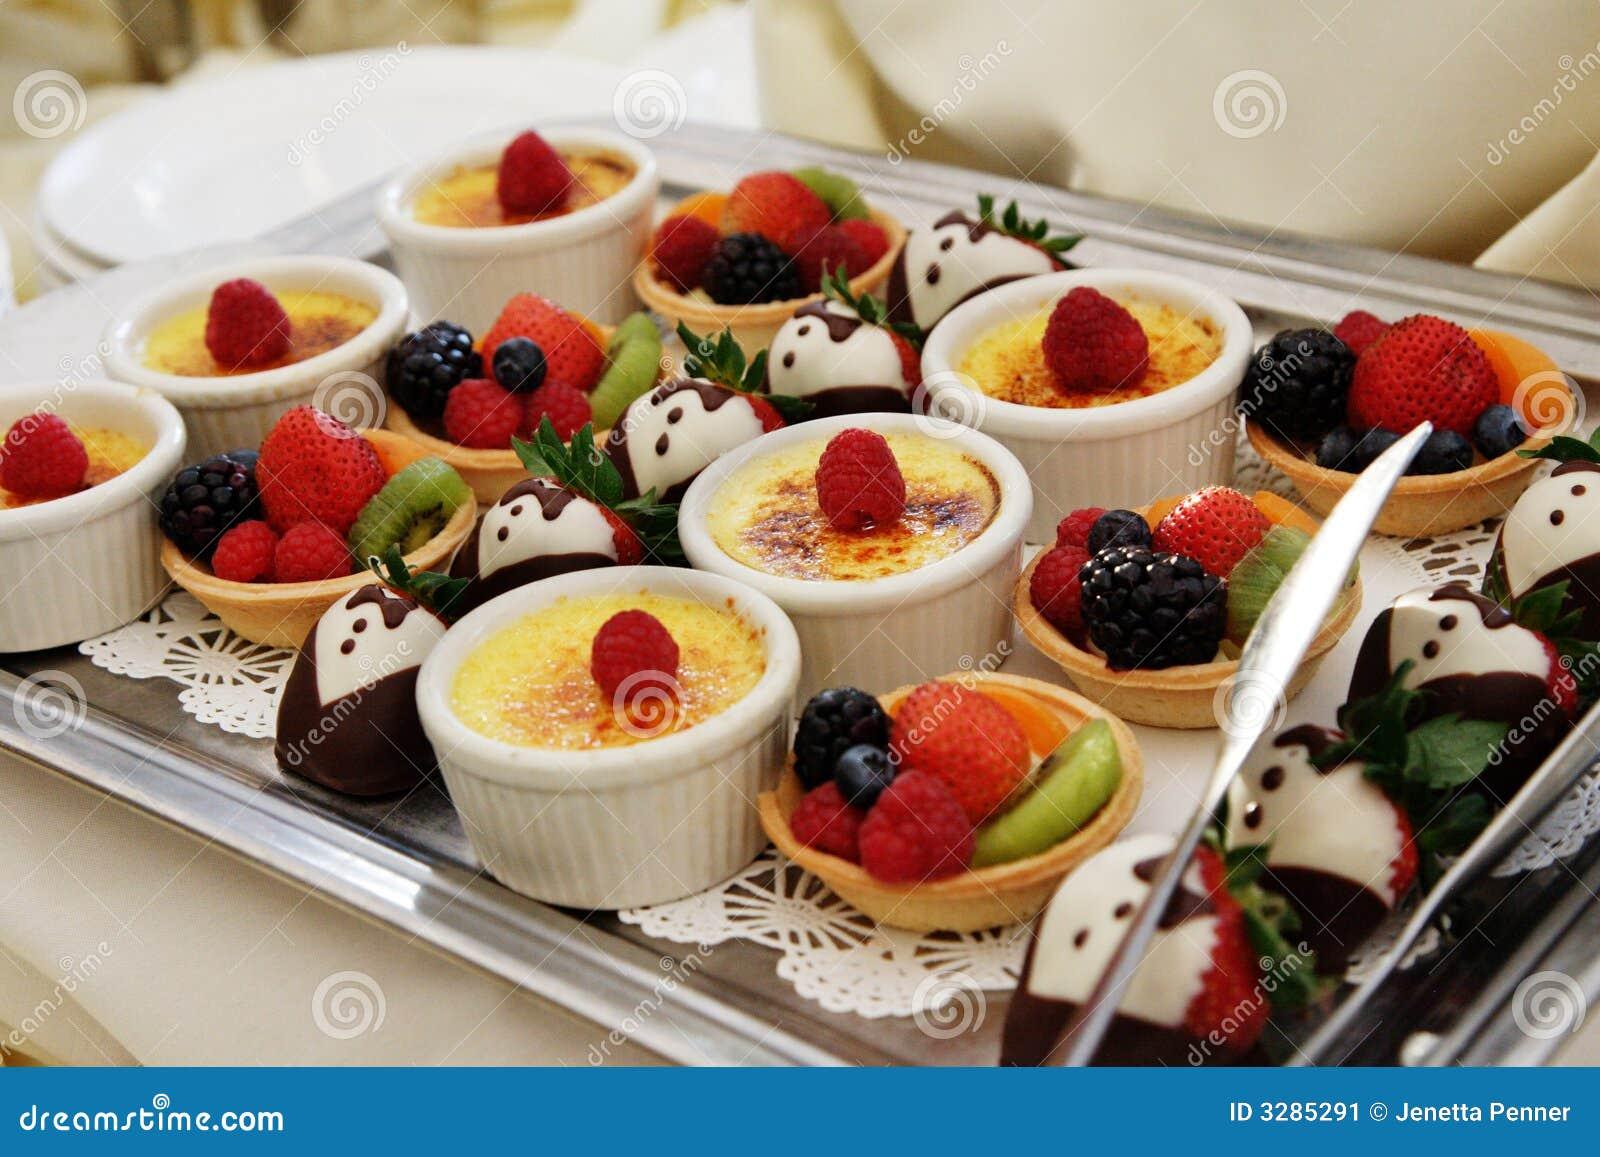 Dessert Tray Stock Image  Image: 3285291